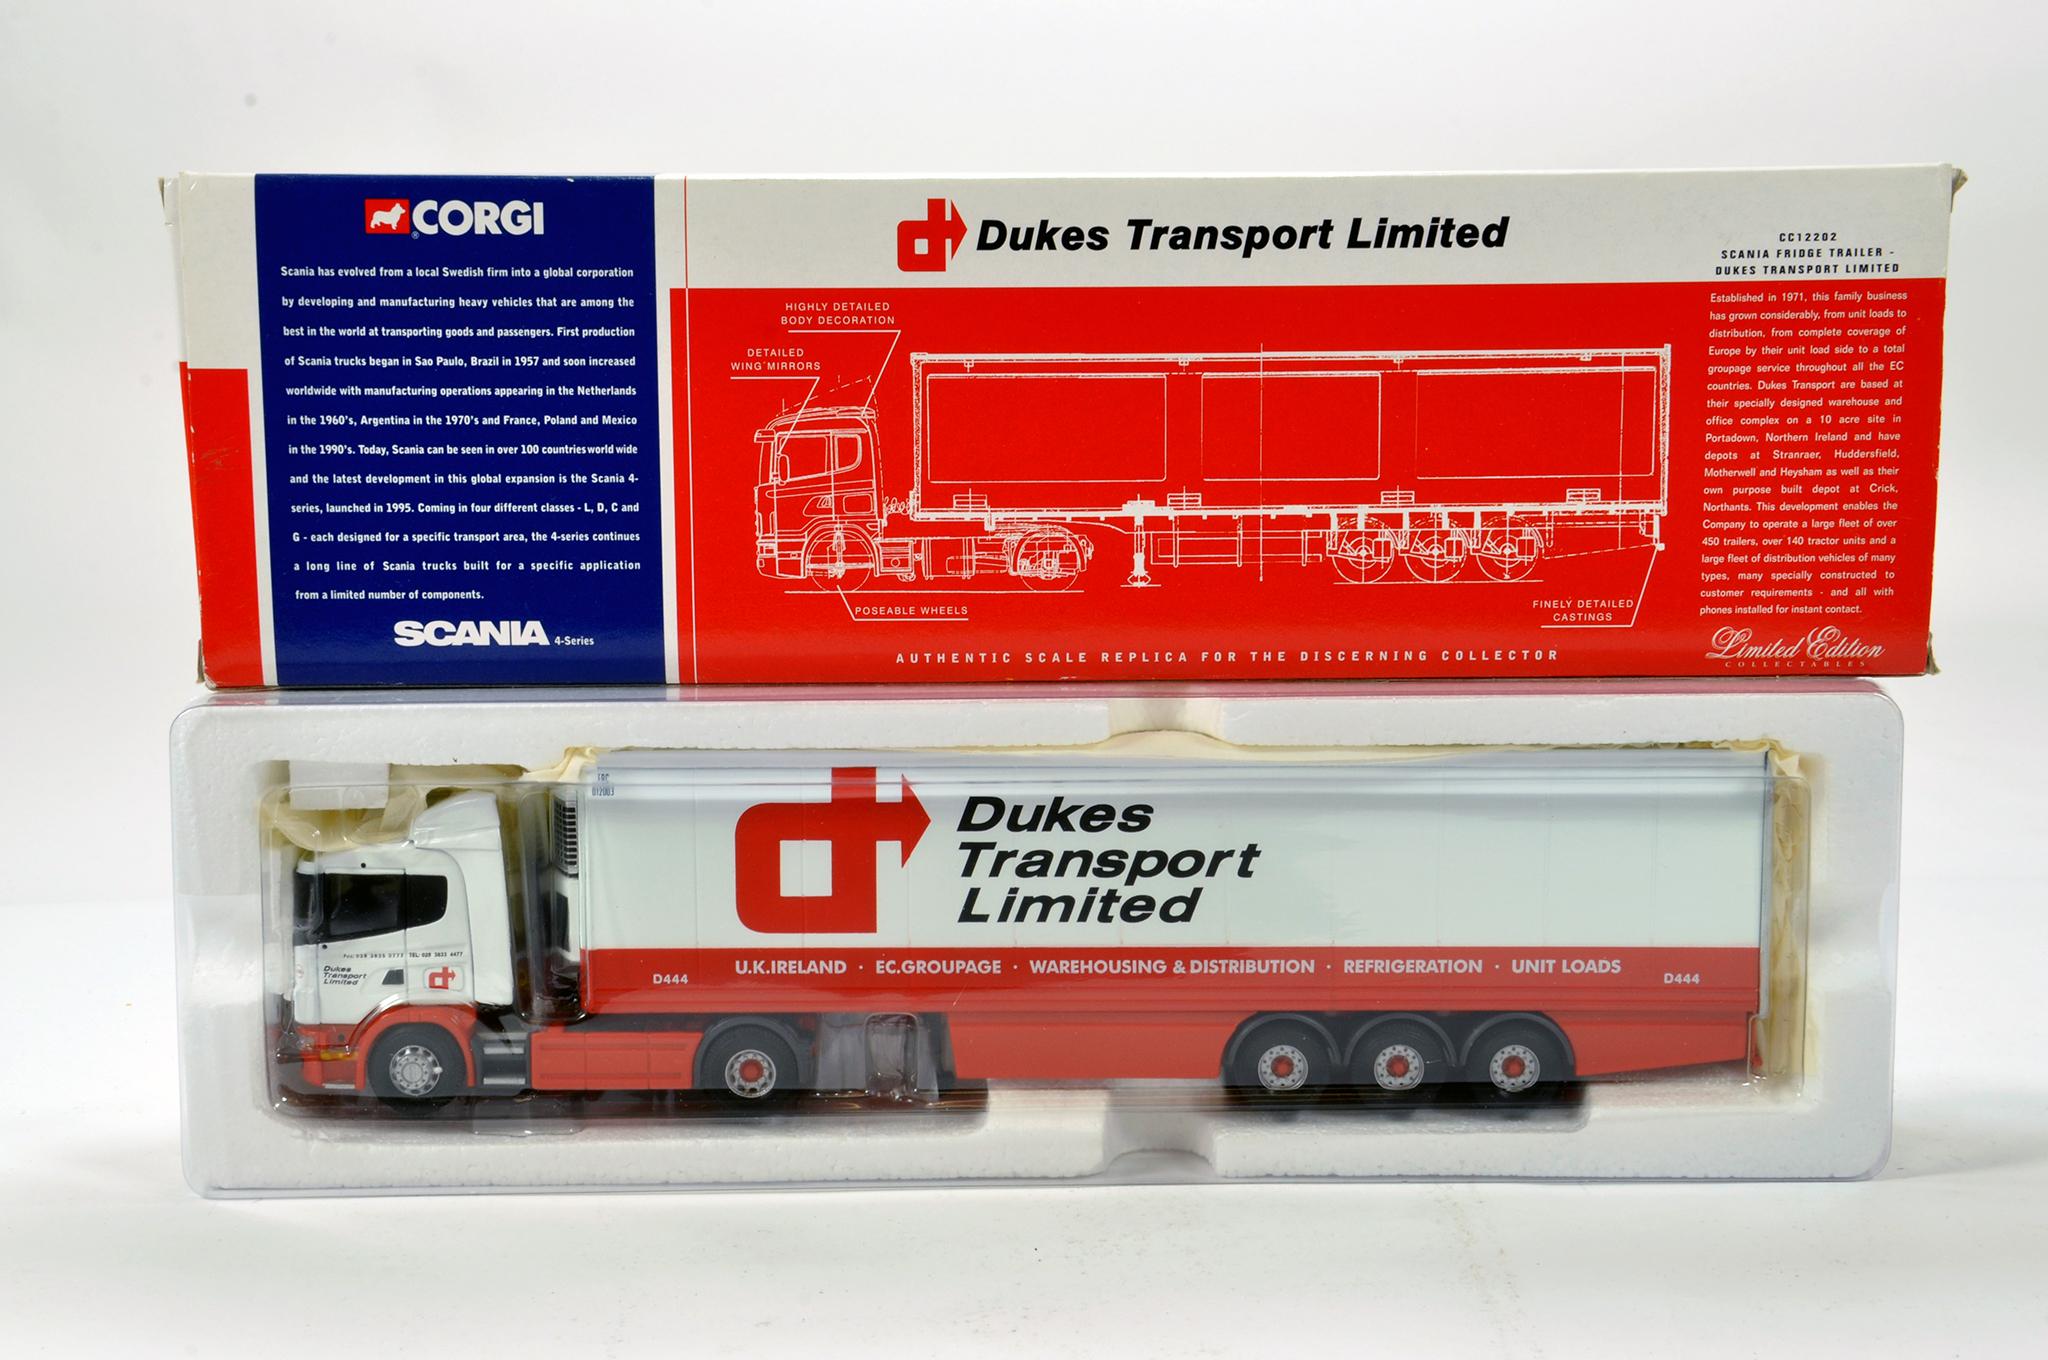 Lot 52 - Corgi 1/50 diecast truck issue comprising No. CC12202 Scania Fridge Trailer in livery of Dukes